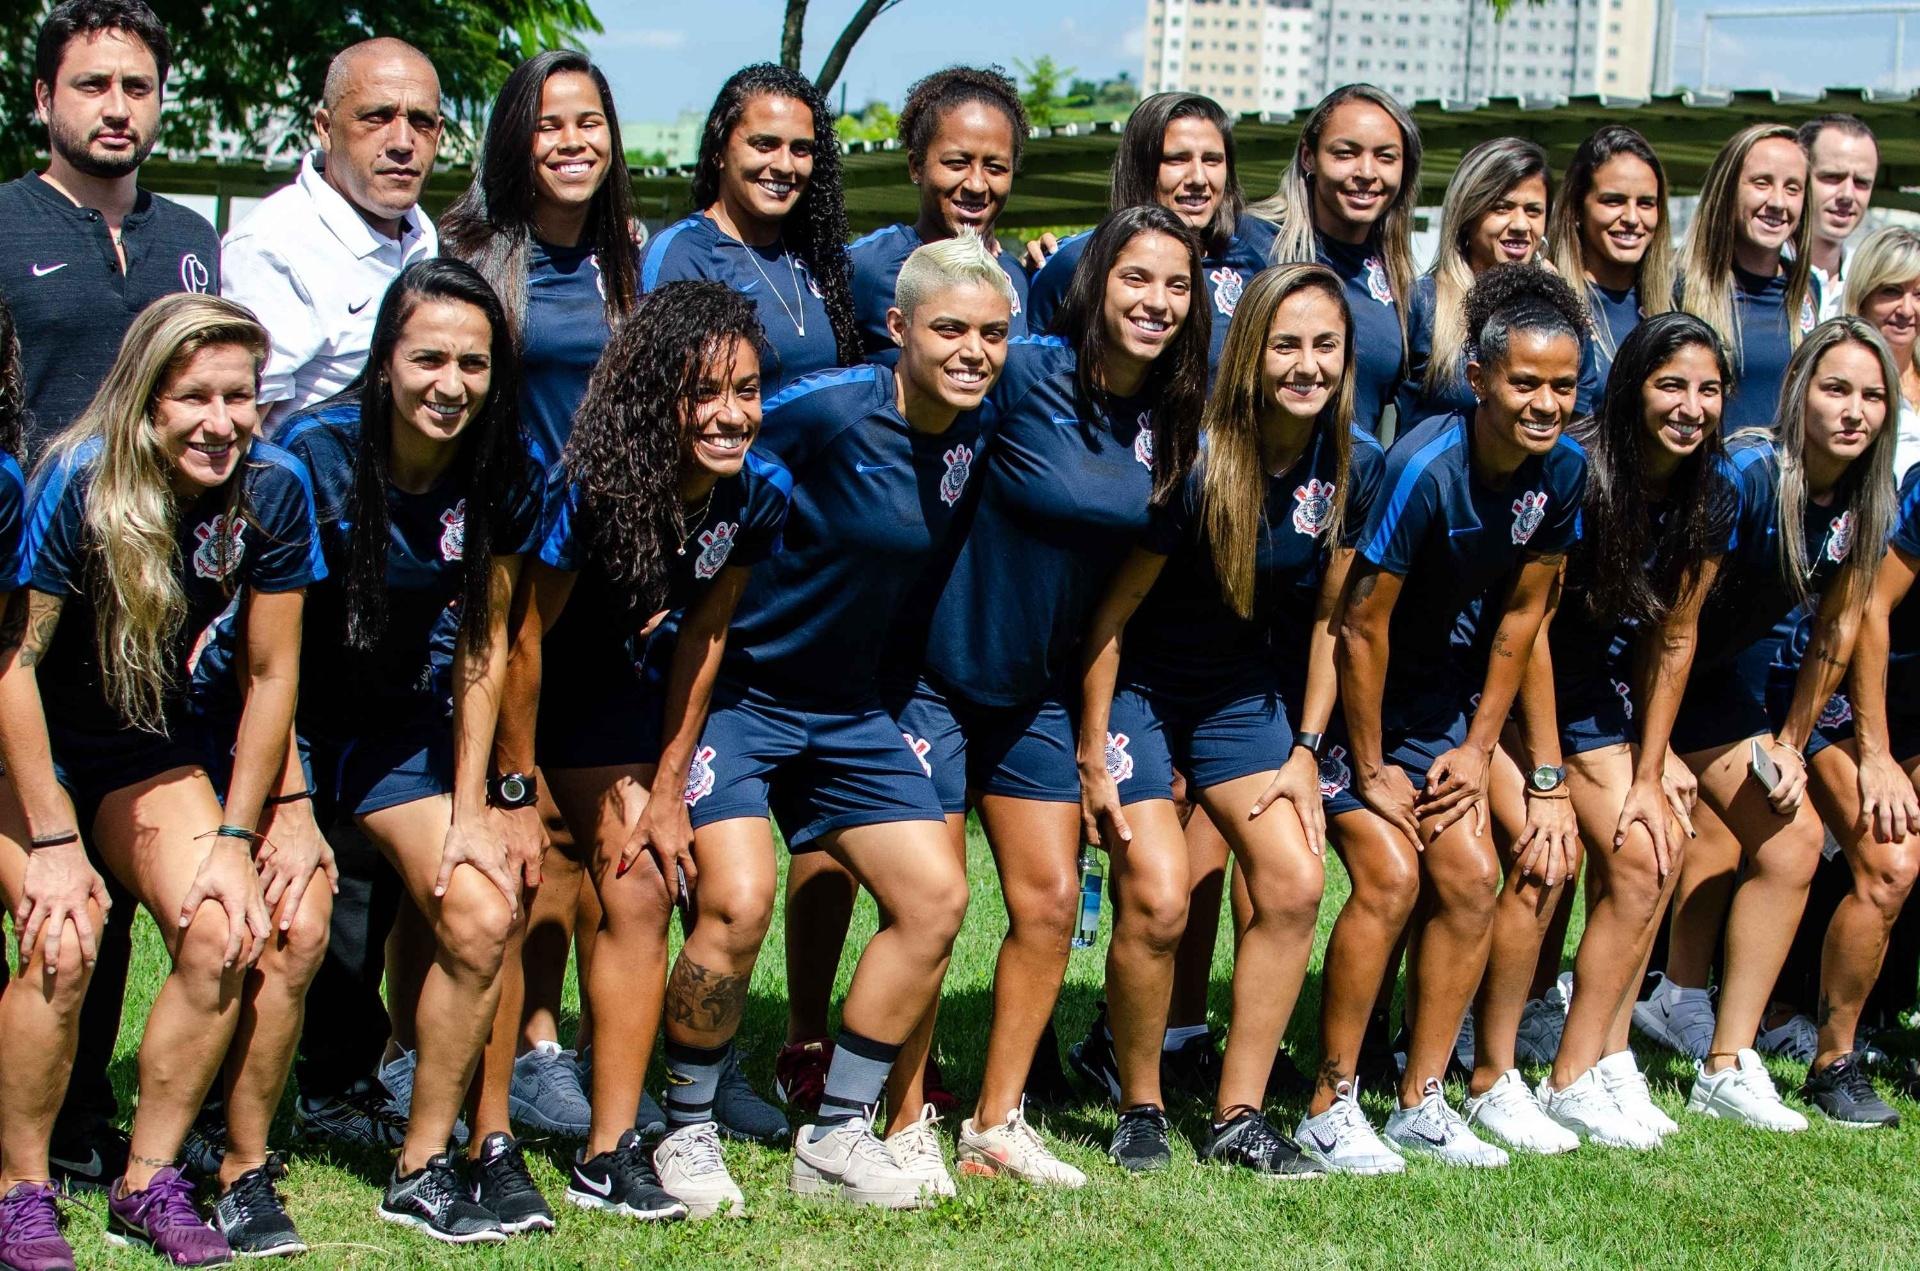 Corinthians apresenta time feminino que busca título pelo 4º ano seguido -  17 01 2019 - UOL Esporte 8940313a11138